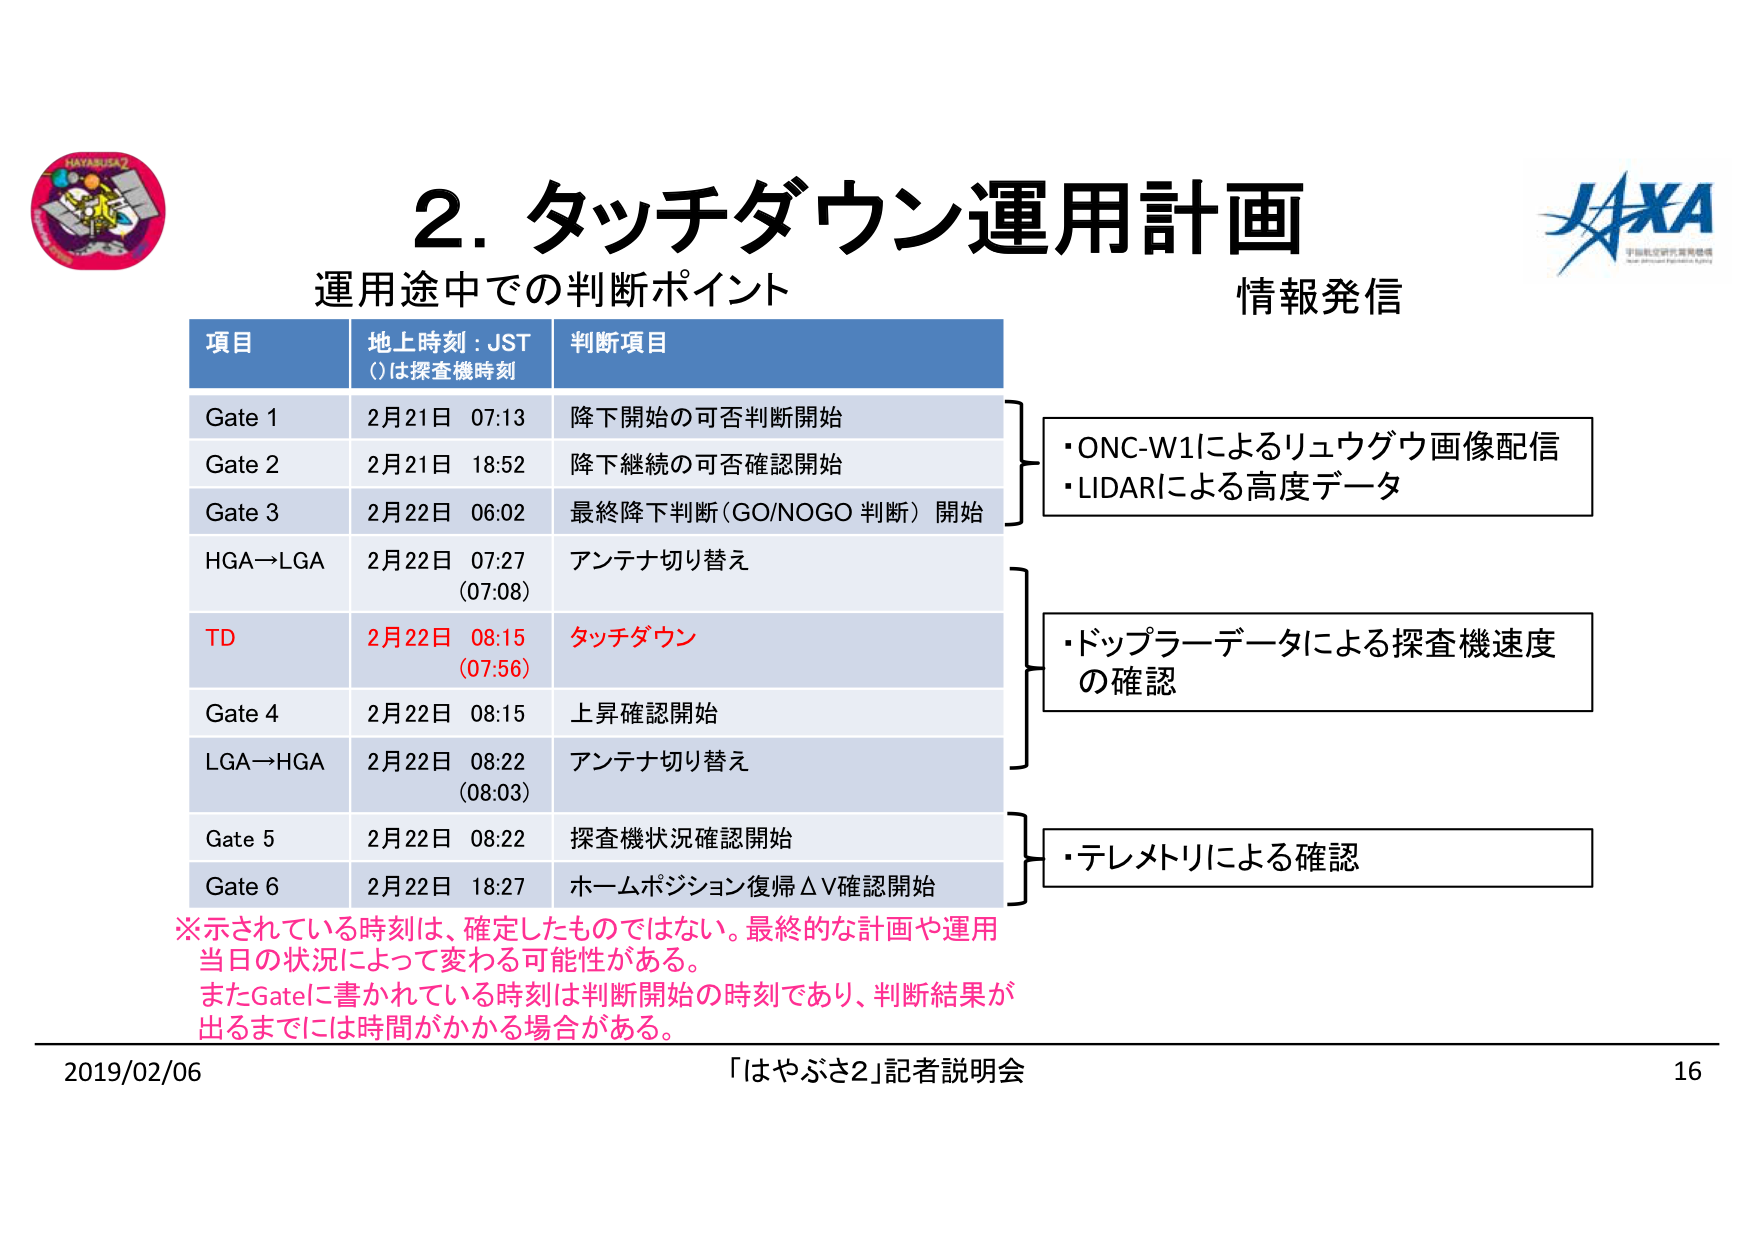 f:id:Imamura:20190204175510p:plain